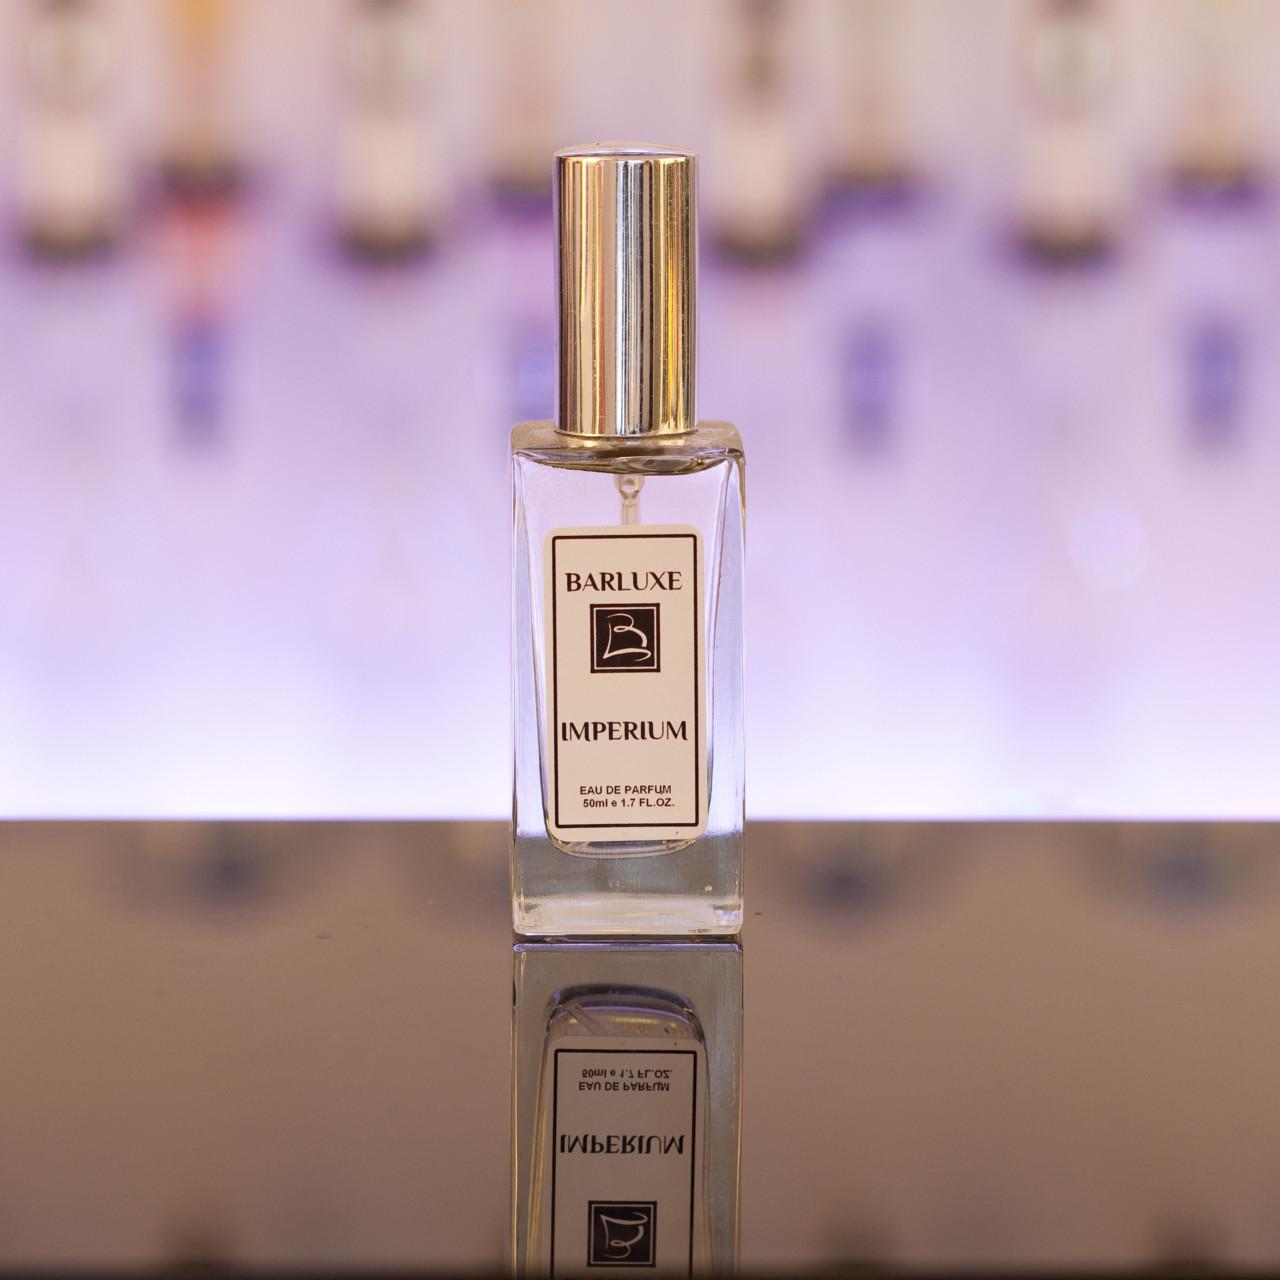 herren-parfum-dupe-double-duft-duftzwilling-imperium